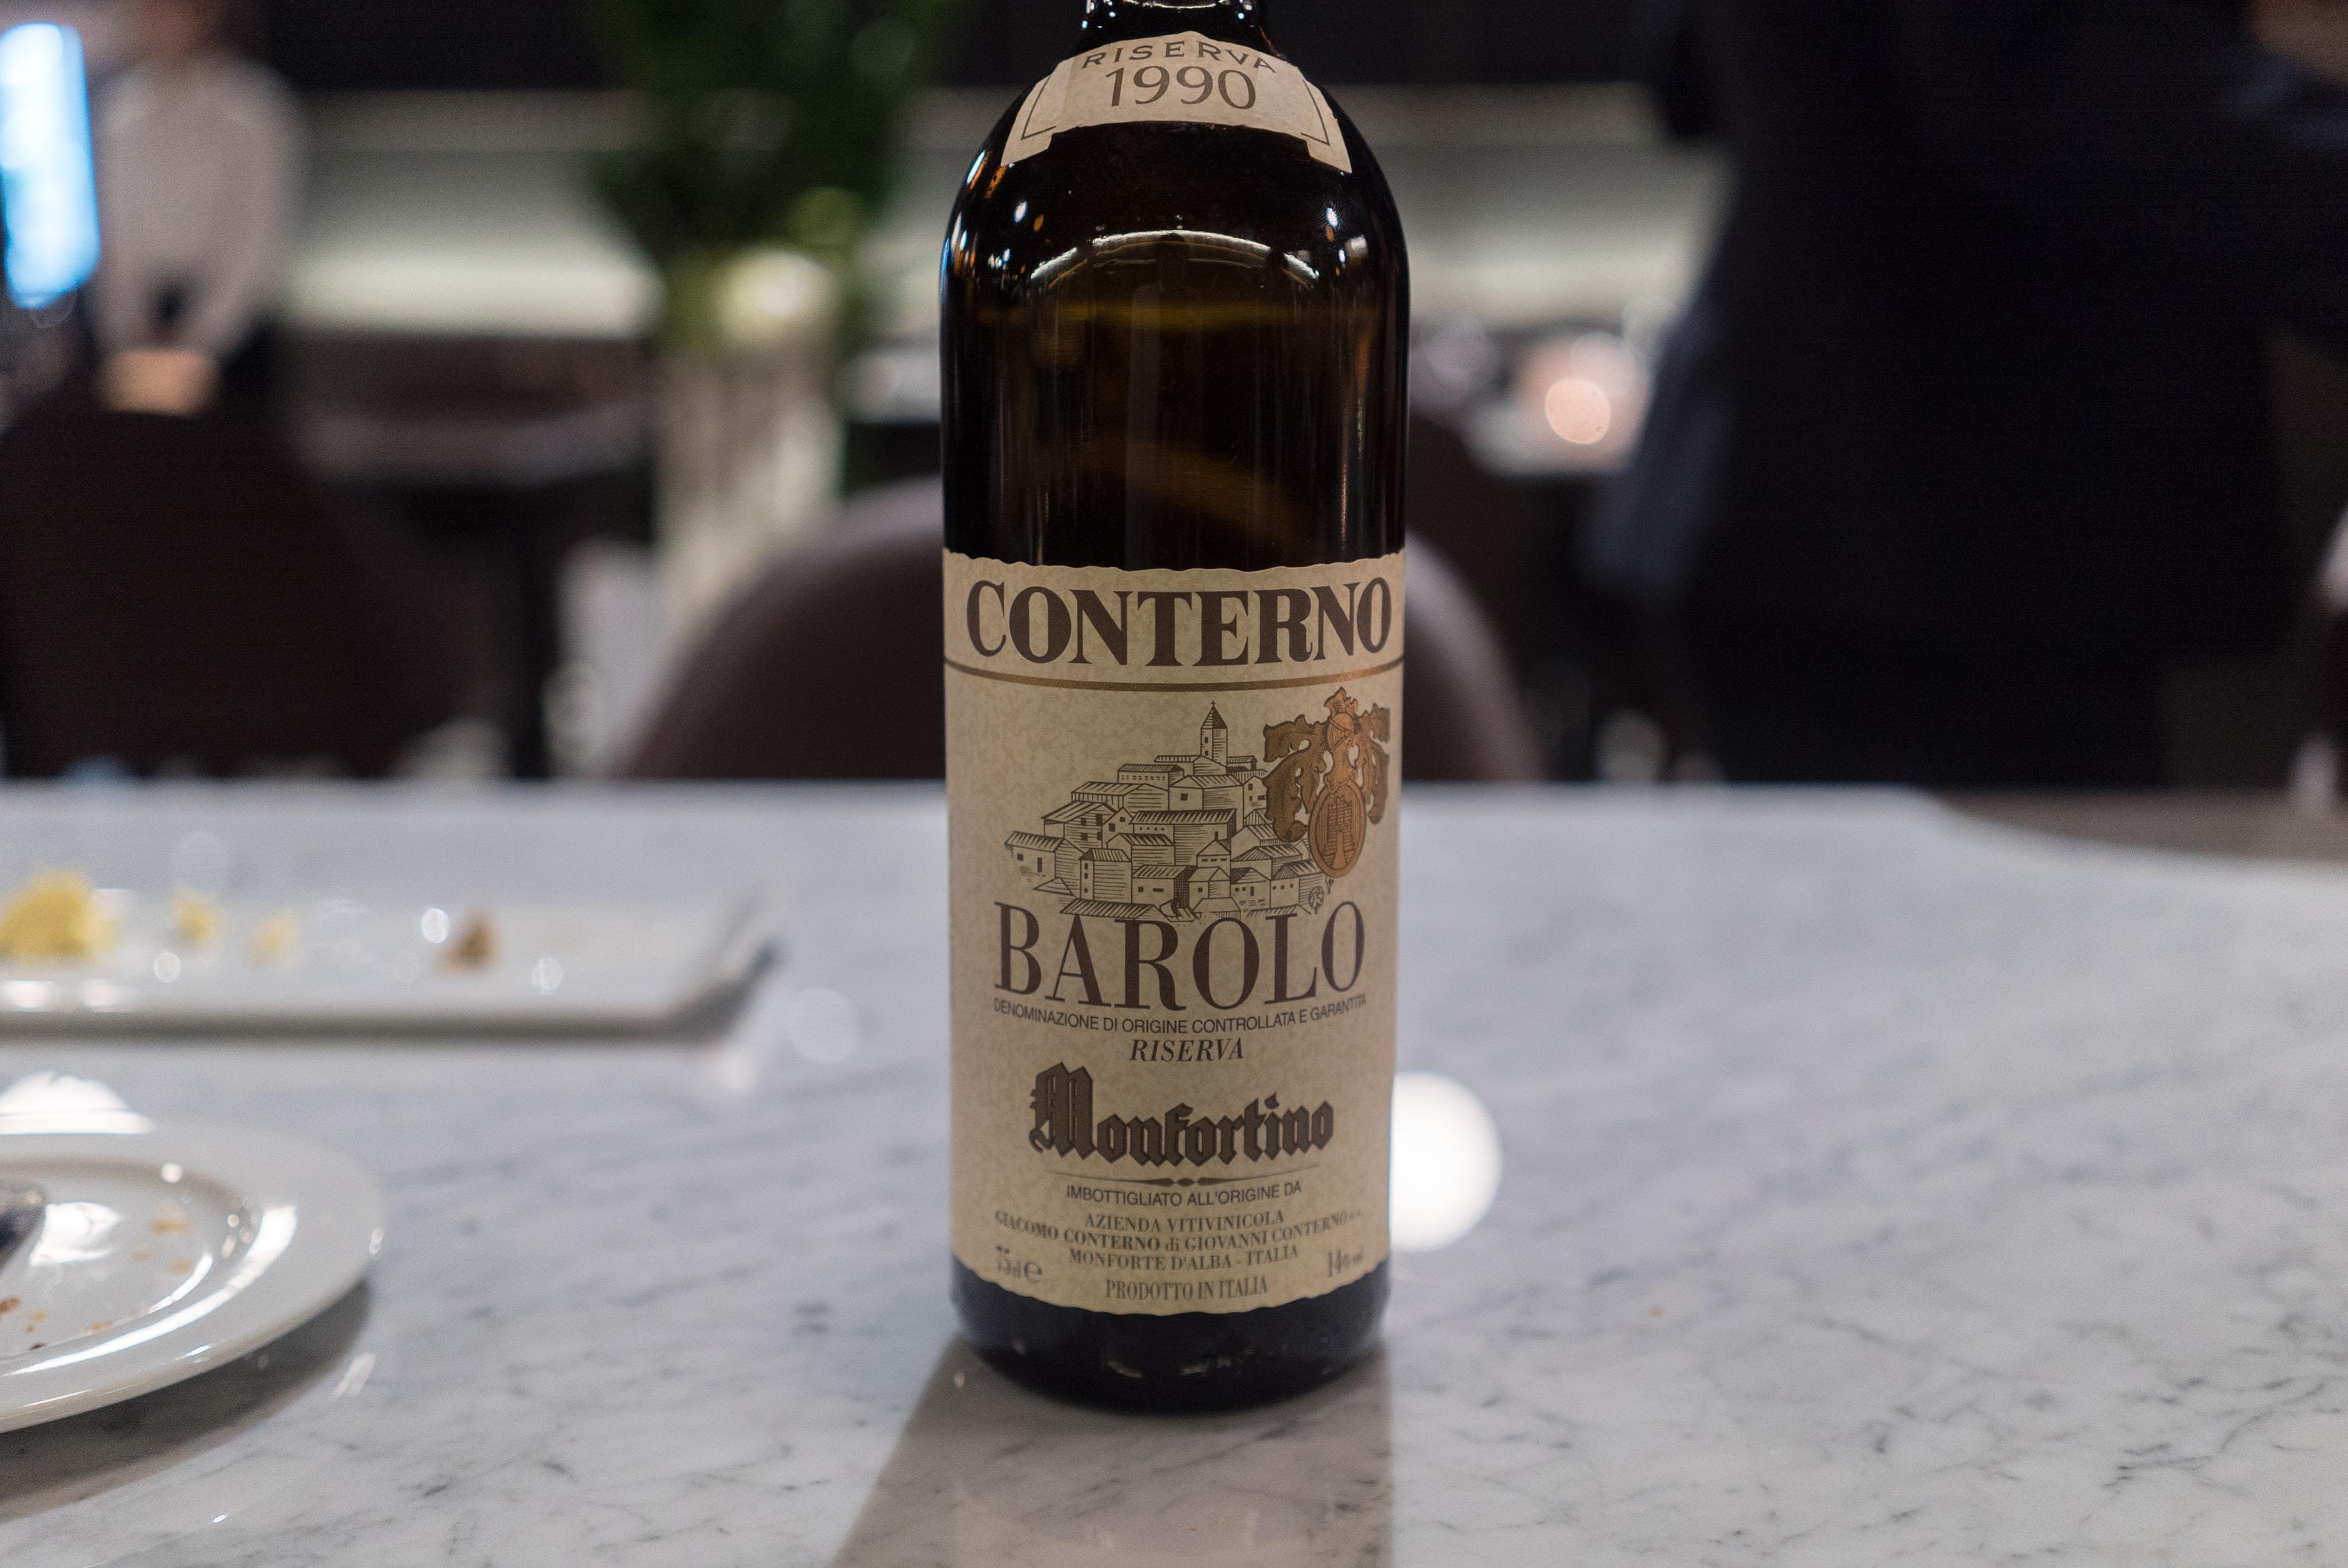 Giacomo Conterno Barolo Monfortino Riserva 1990